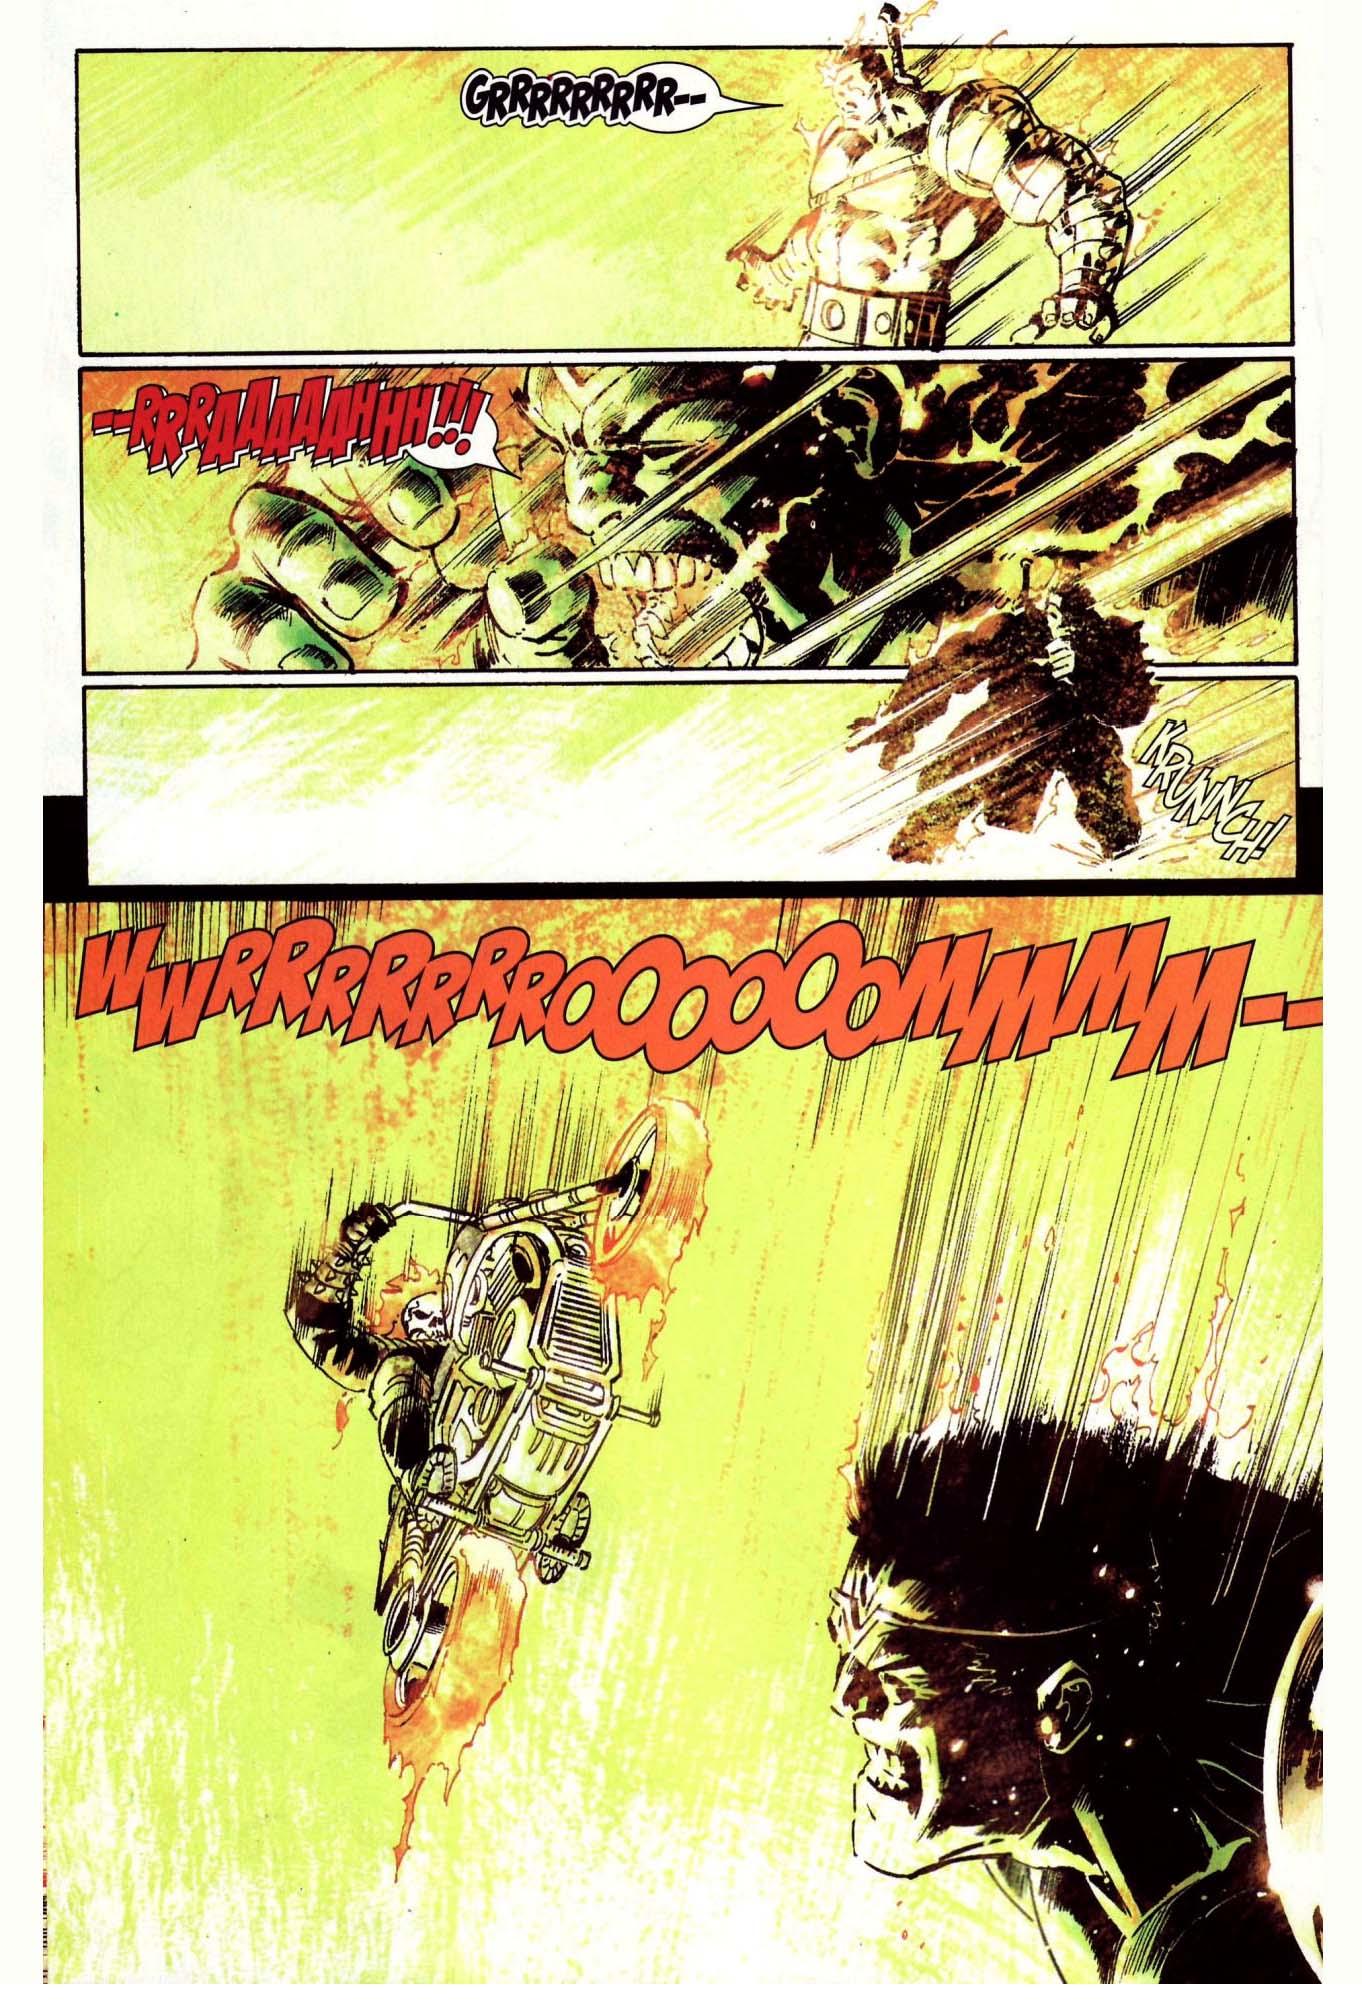 ghostrider vs hulk 3